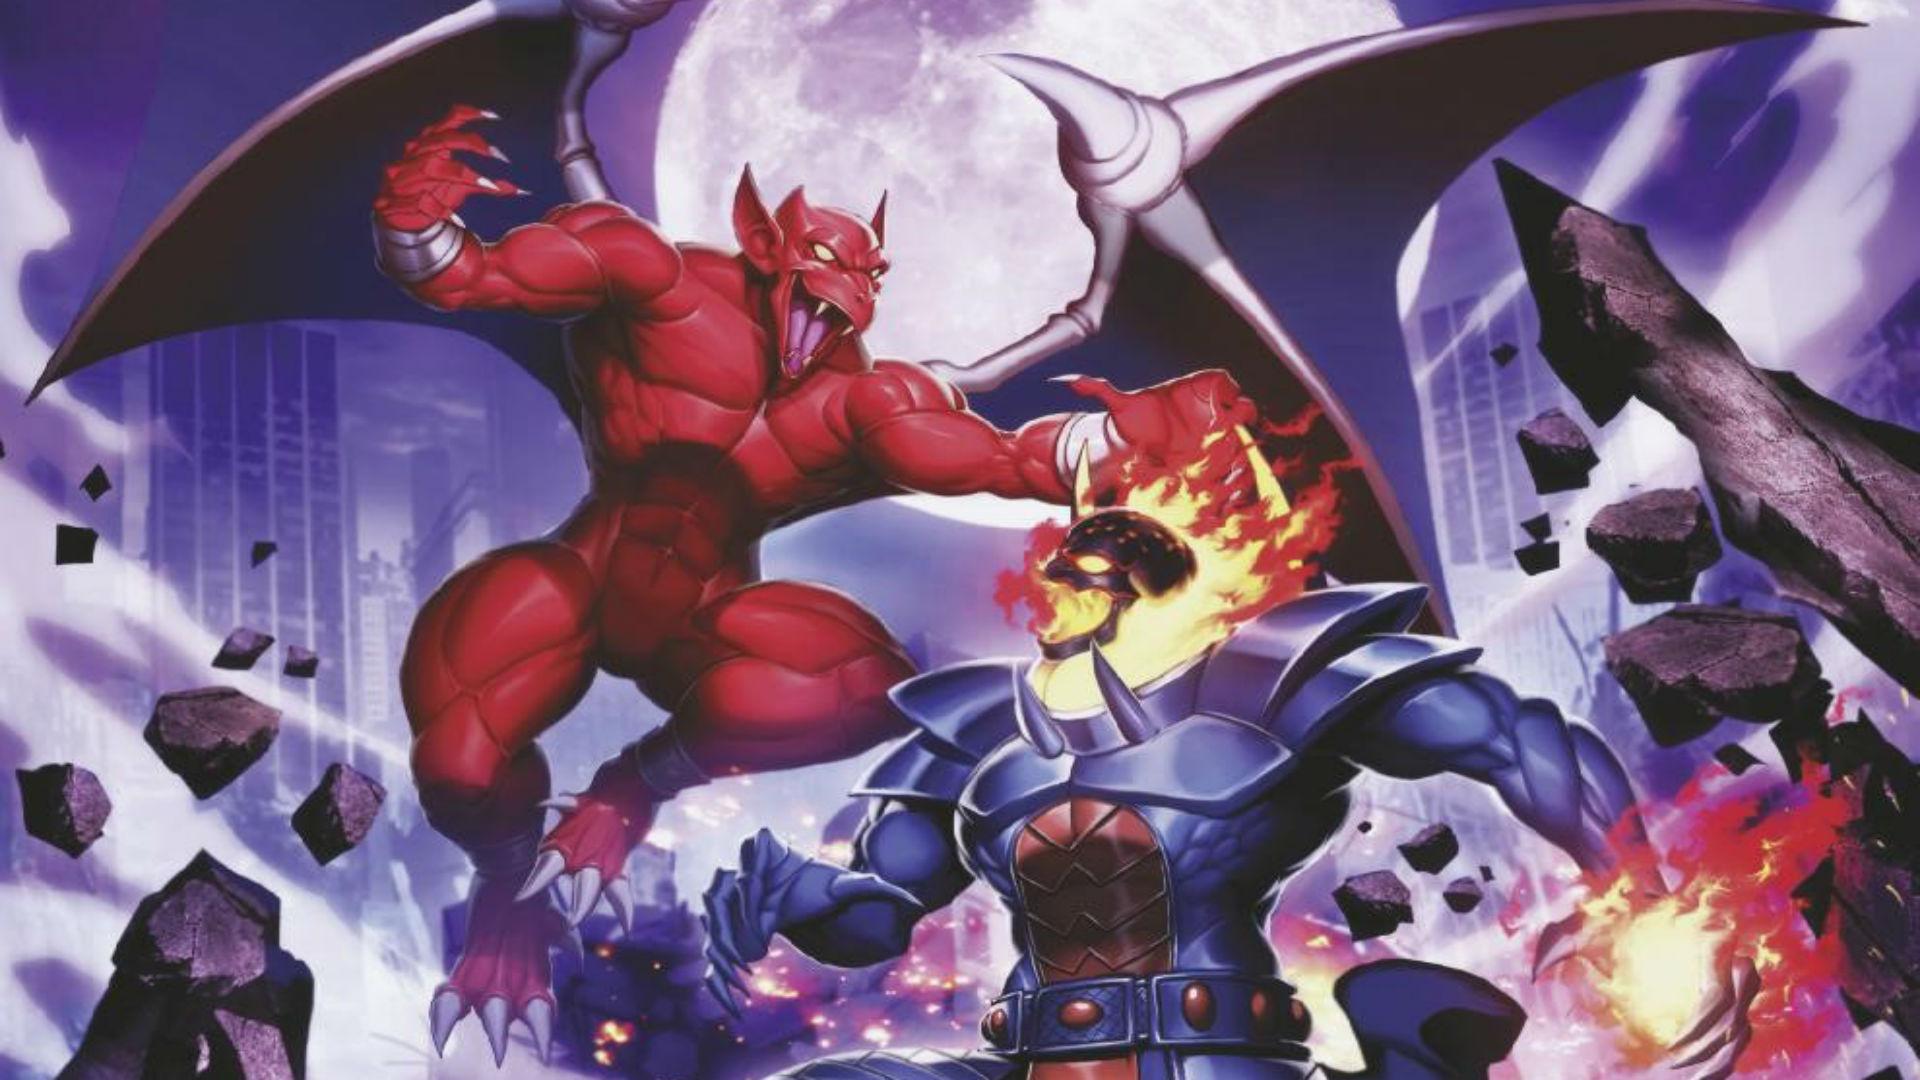 Dormammu and Firebrand returning for Marvel vs. Capcom: Infinite screenshot